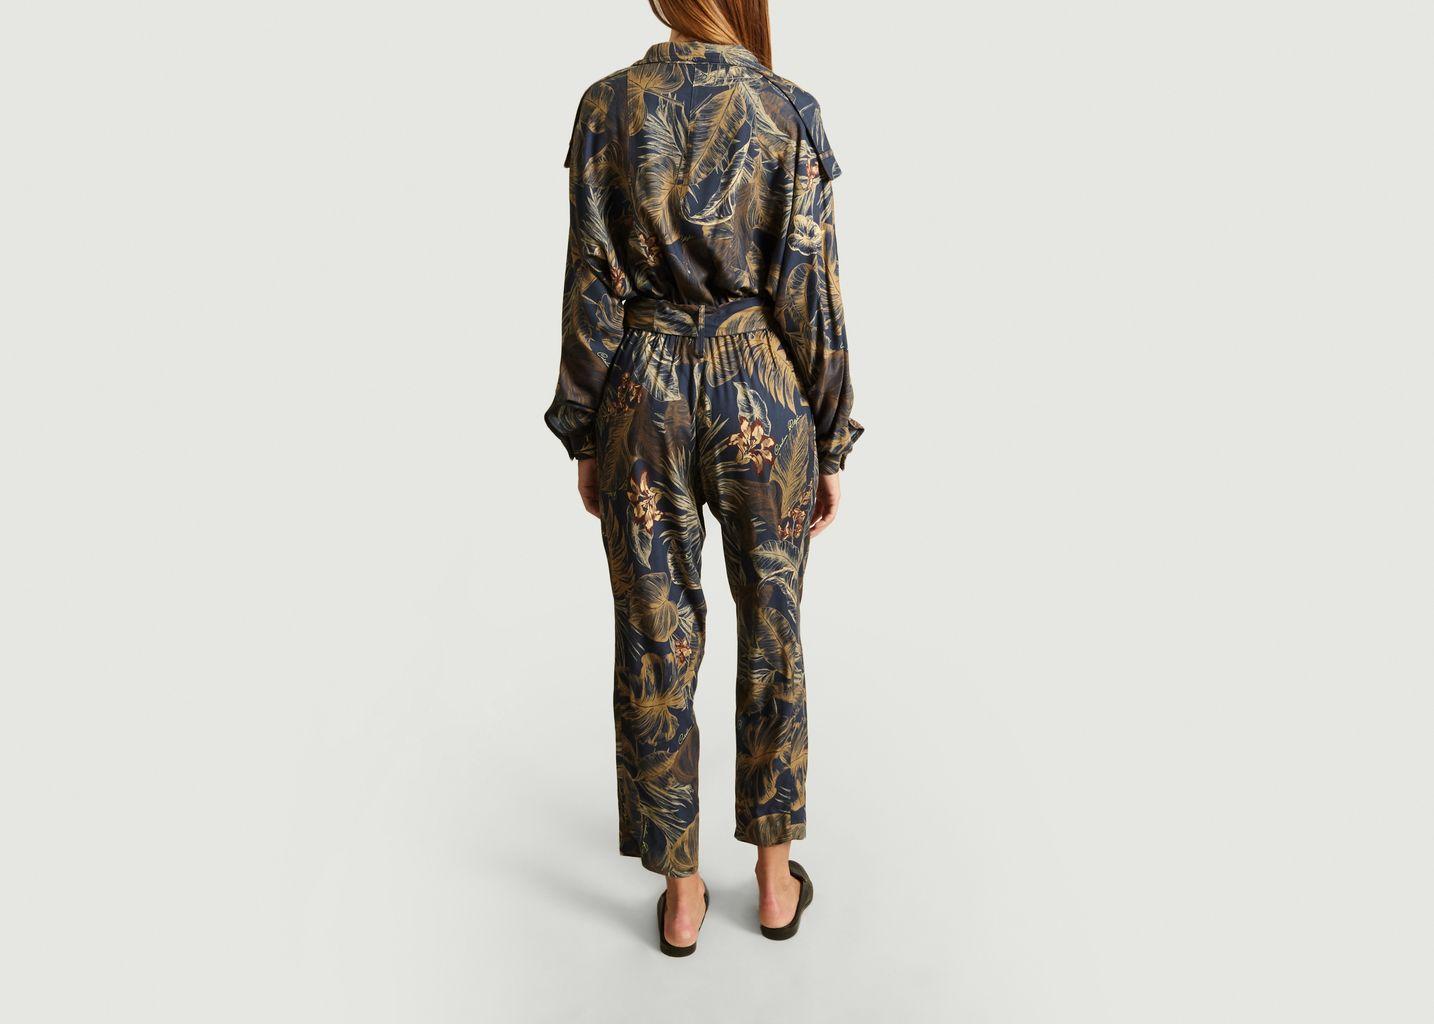 Combinaison Print Jungle Dallas - Carolina Ritzler